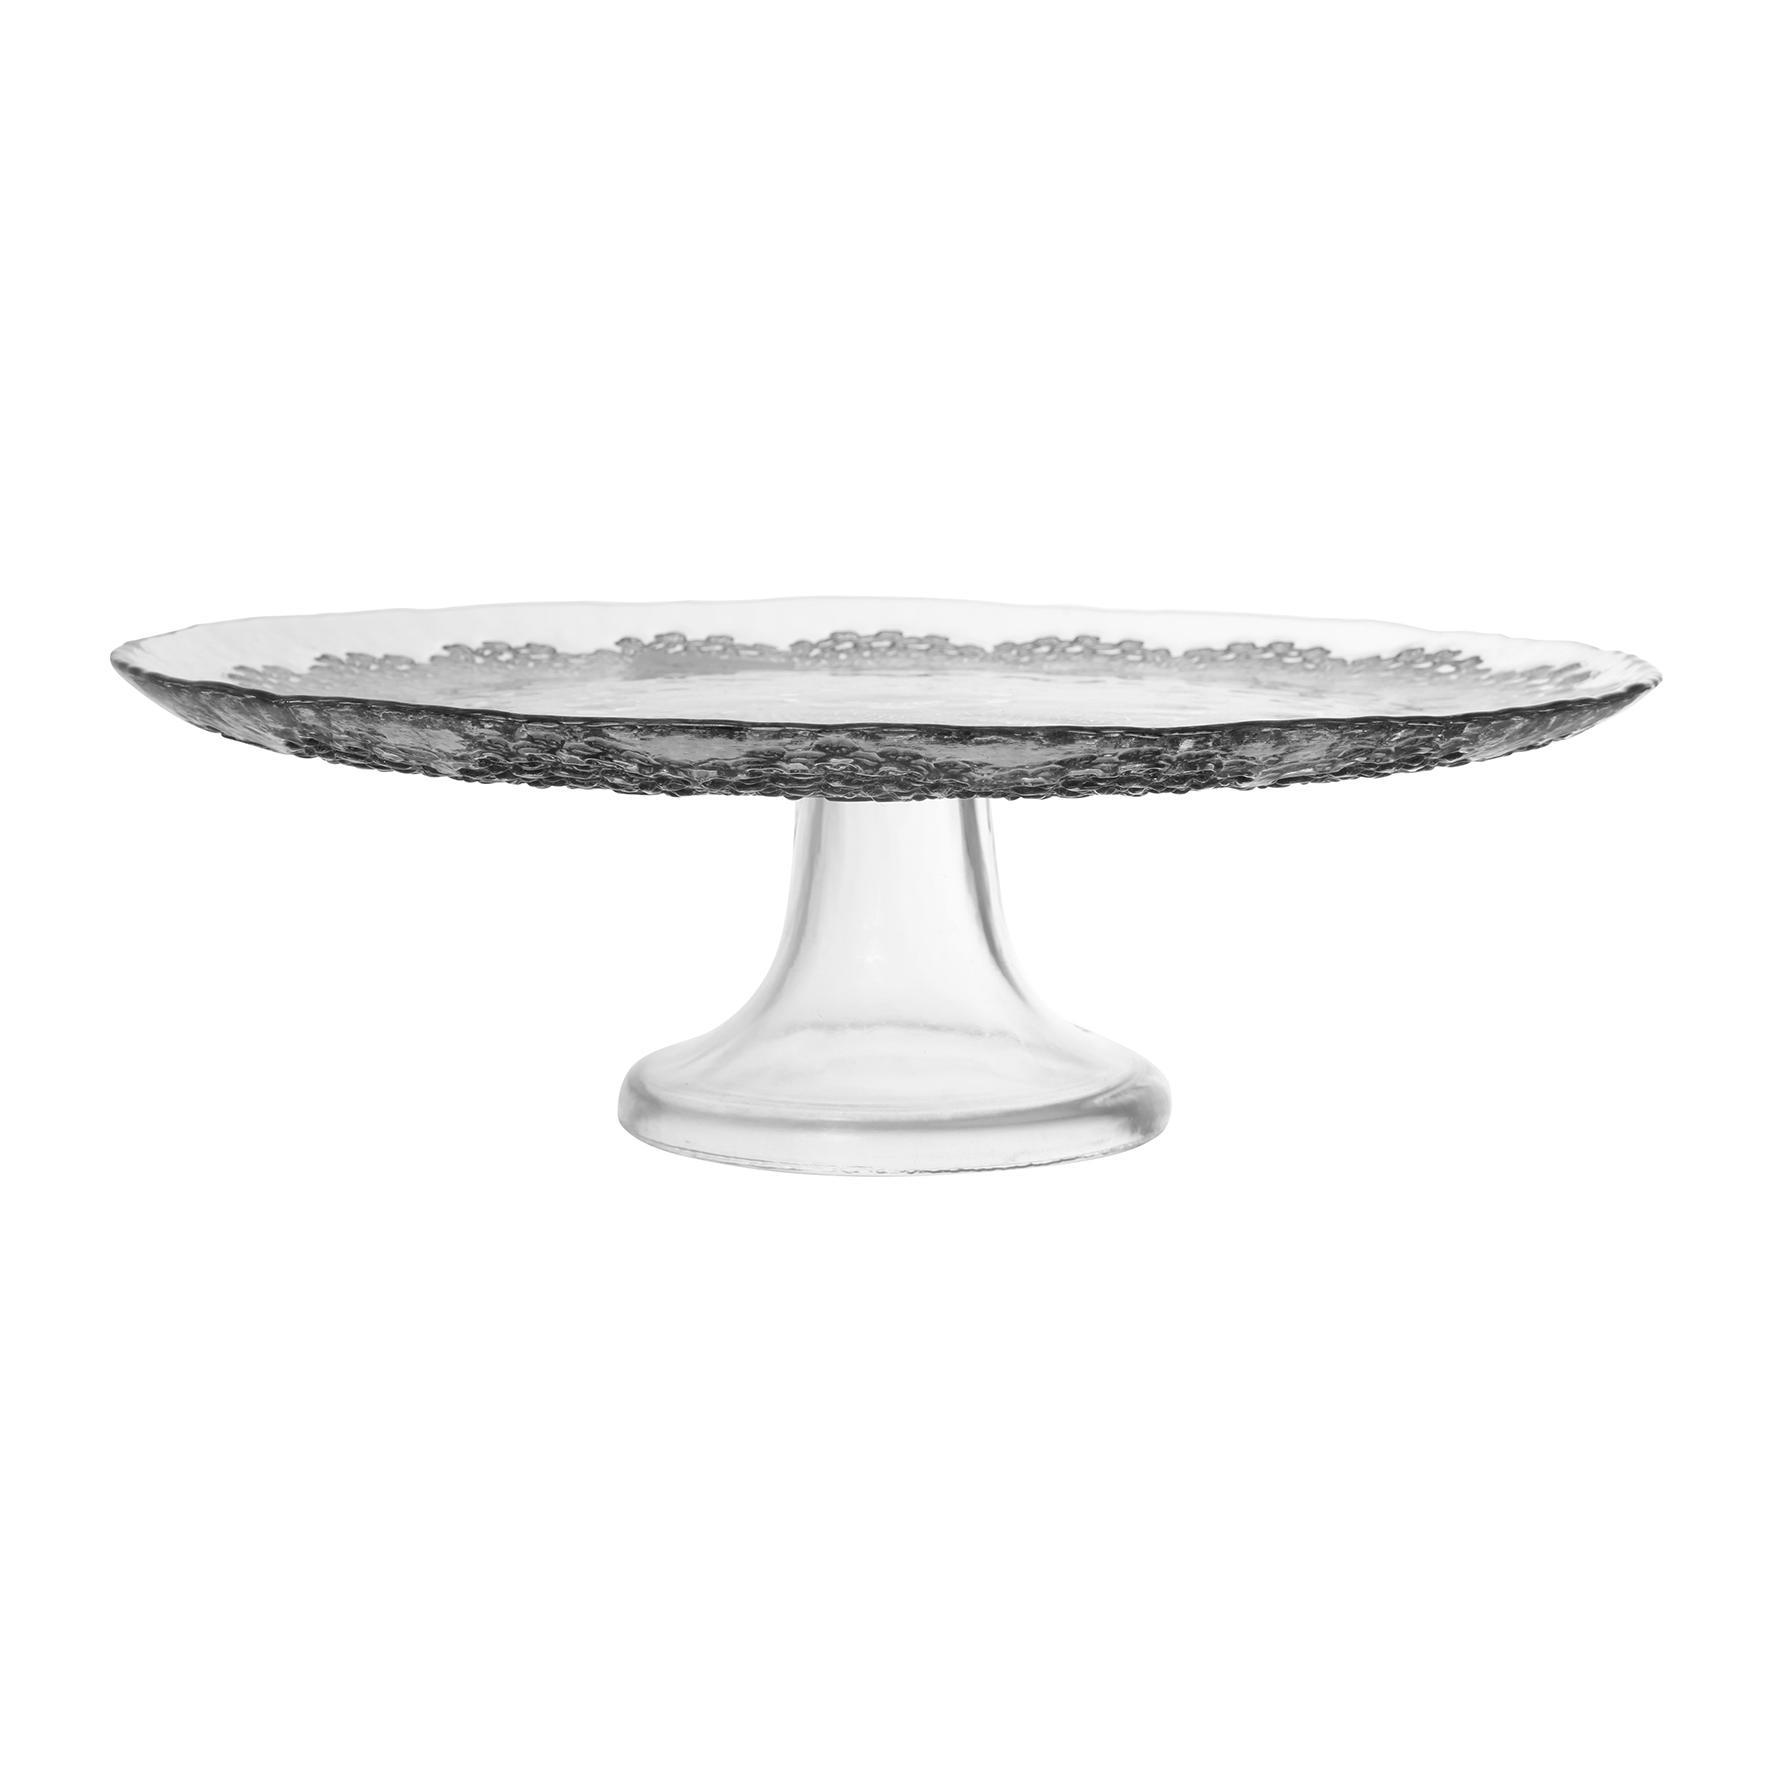 CÔTÉ TABLE Dortový stojan Baroq Fume, šedá barva, sklo